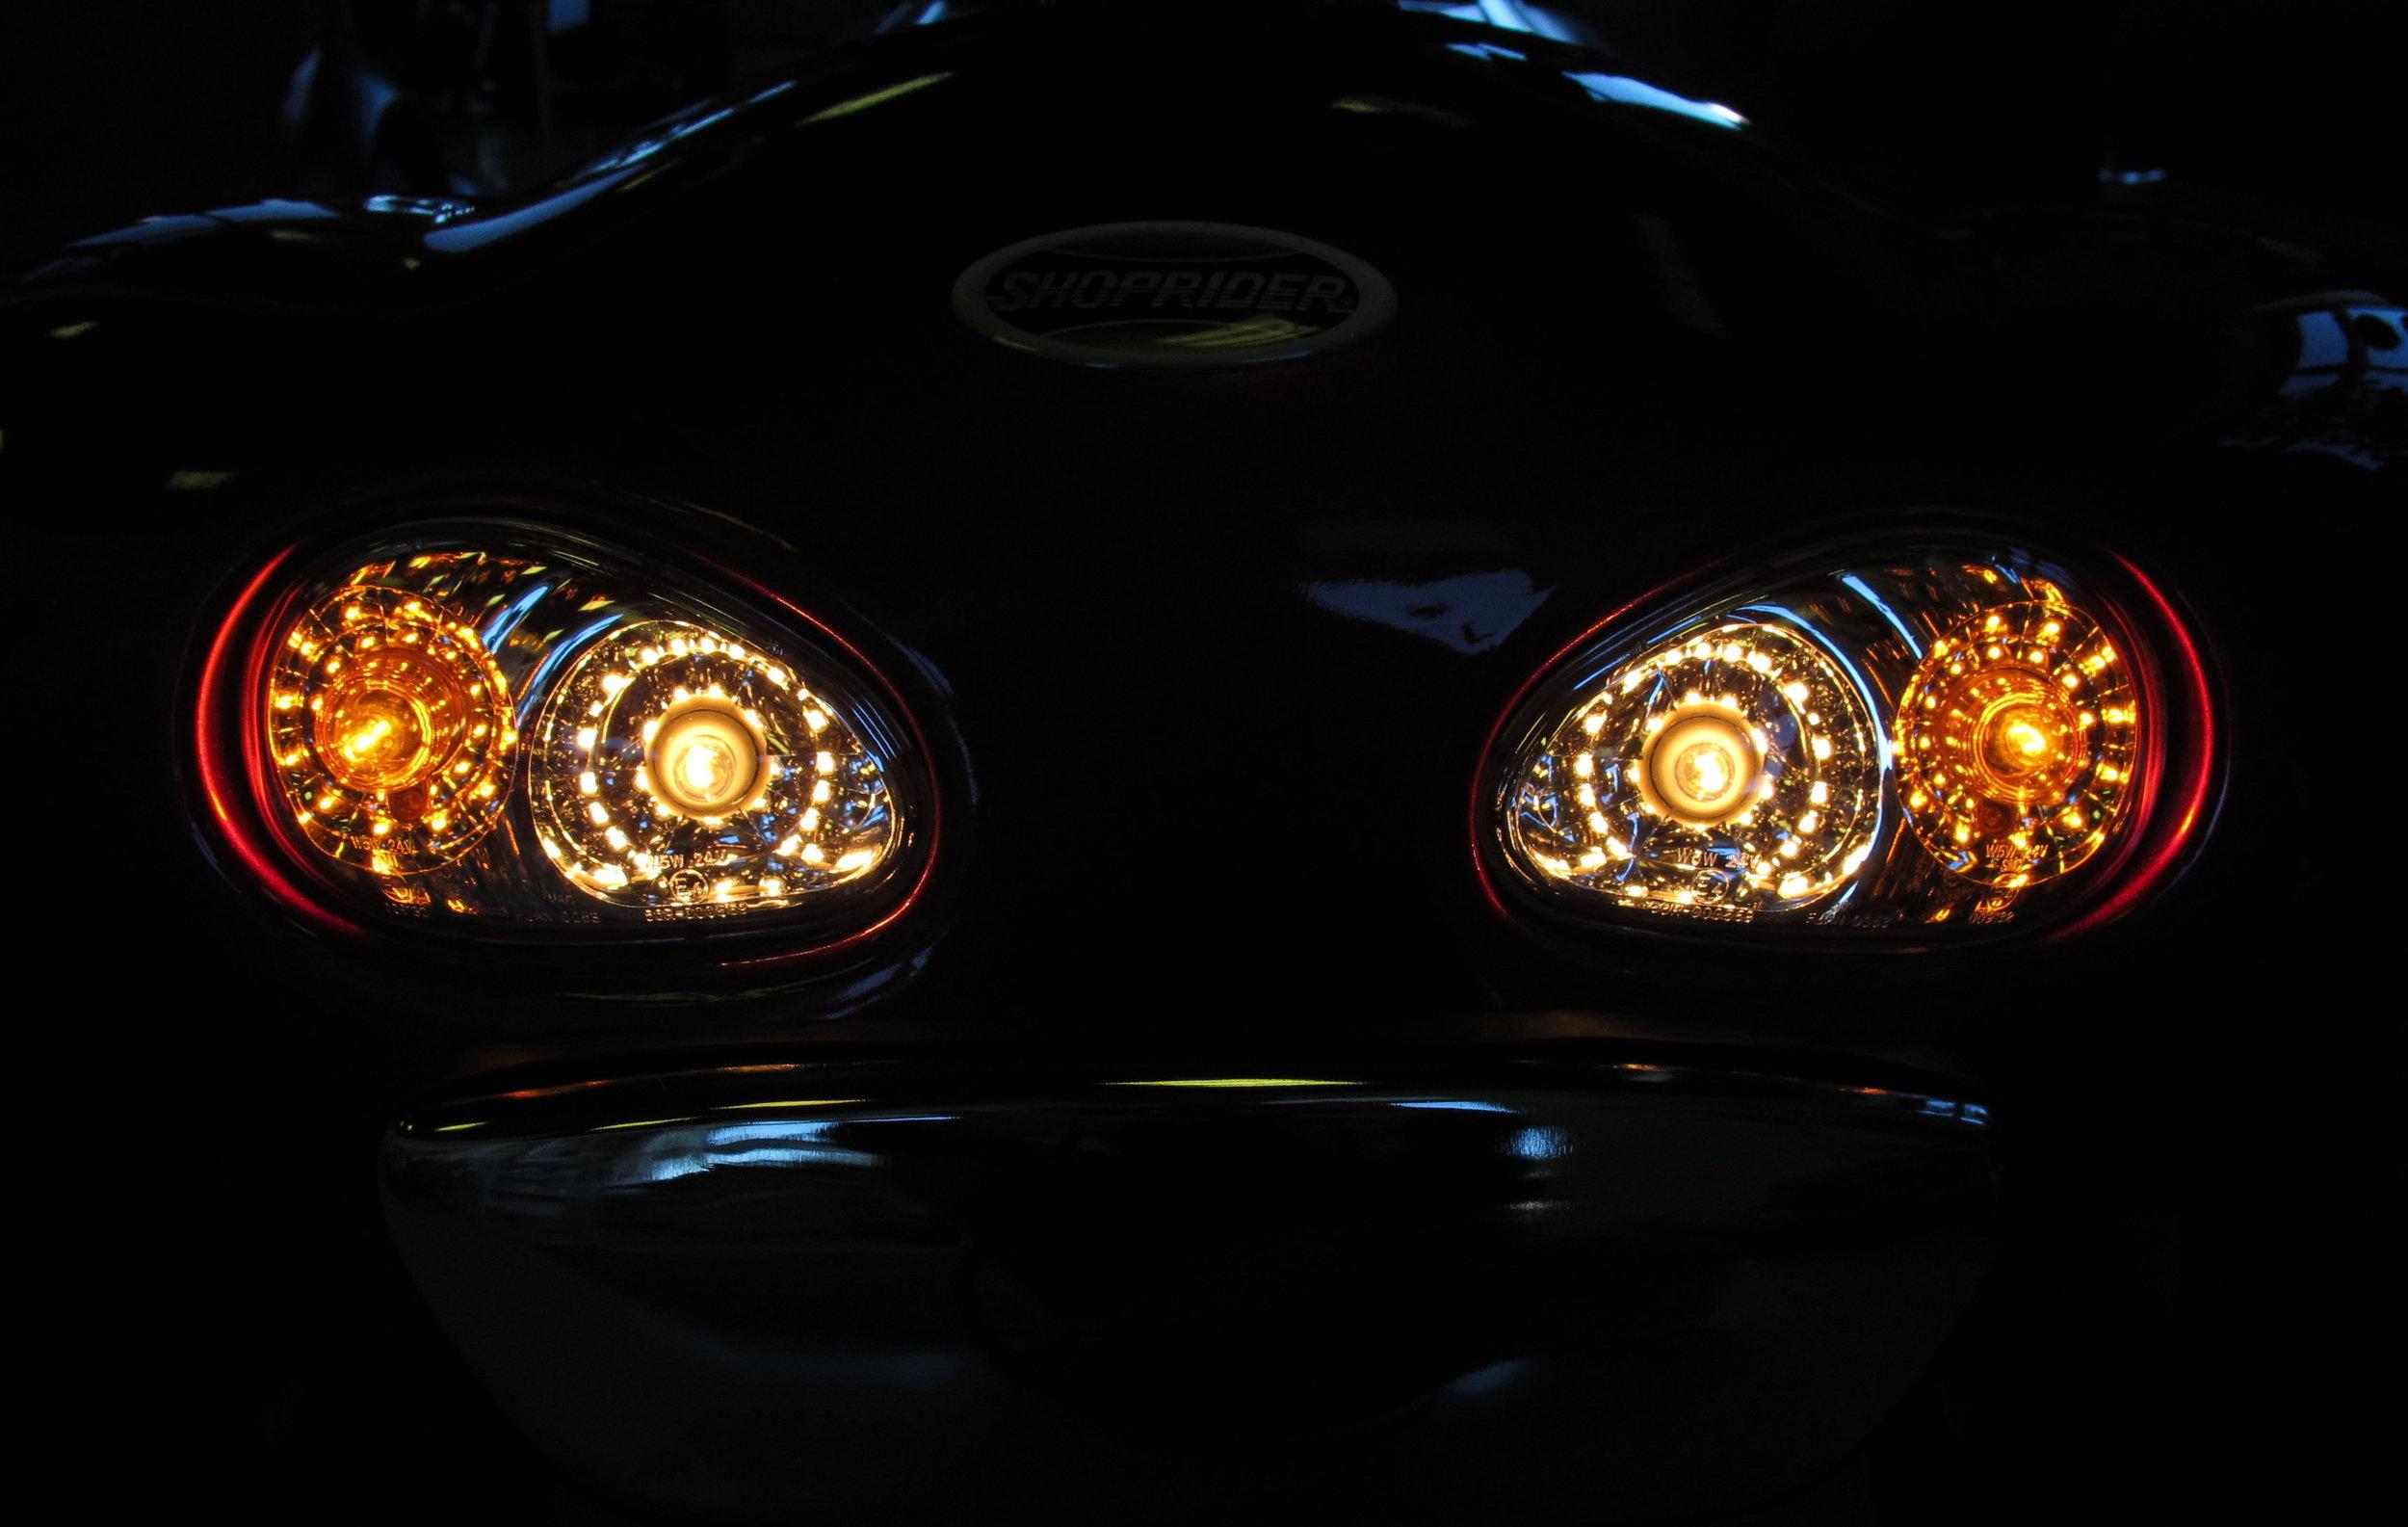 889headlight.JPG